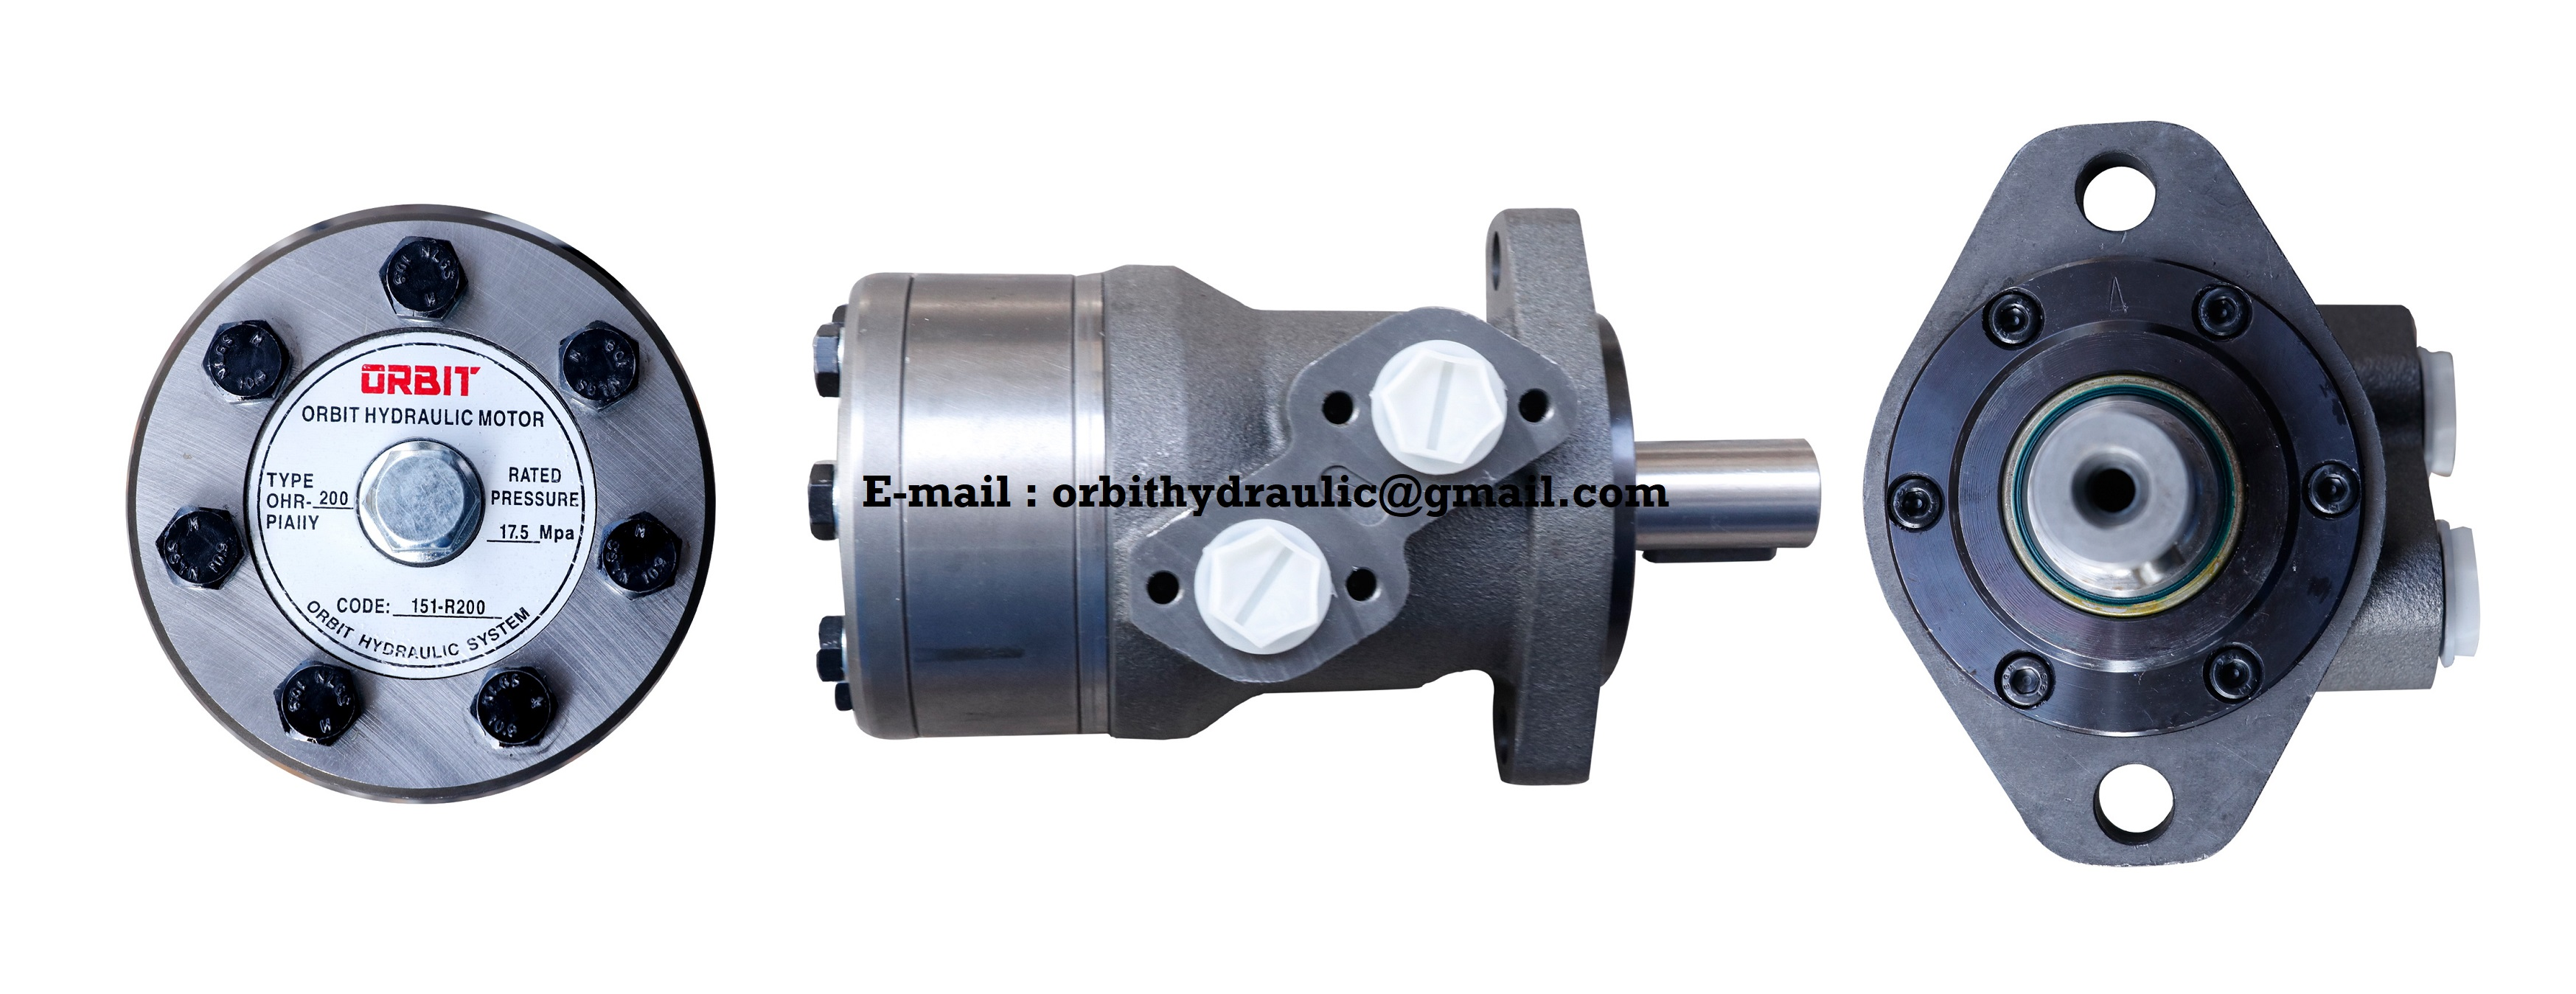 ORBIT OHR of OHR50, OHR80, OHR100, OHR125, OHR160, OHR200, OHR250, OHR315, OHR375 ORBIT Hydraulic Motor